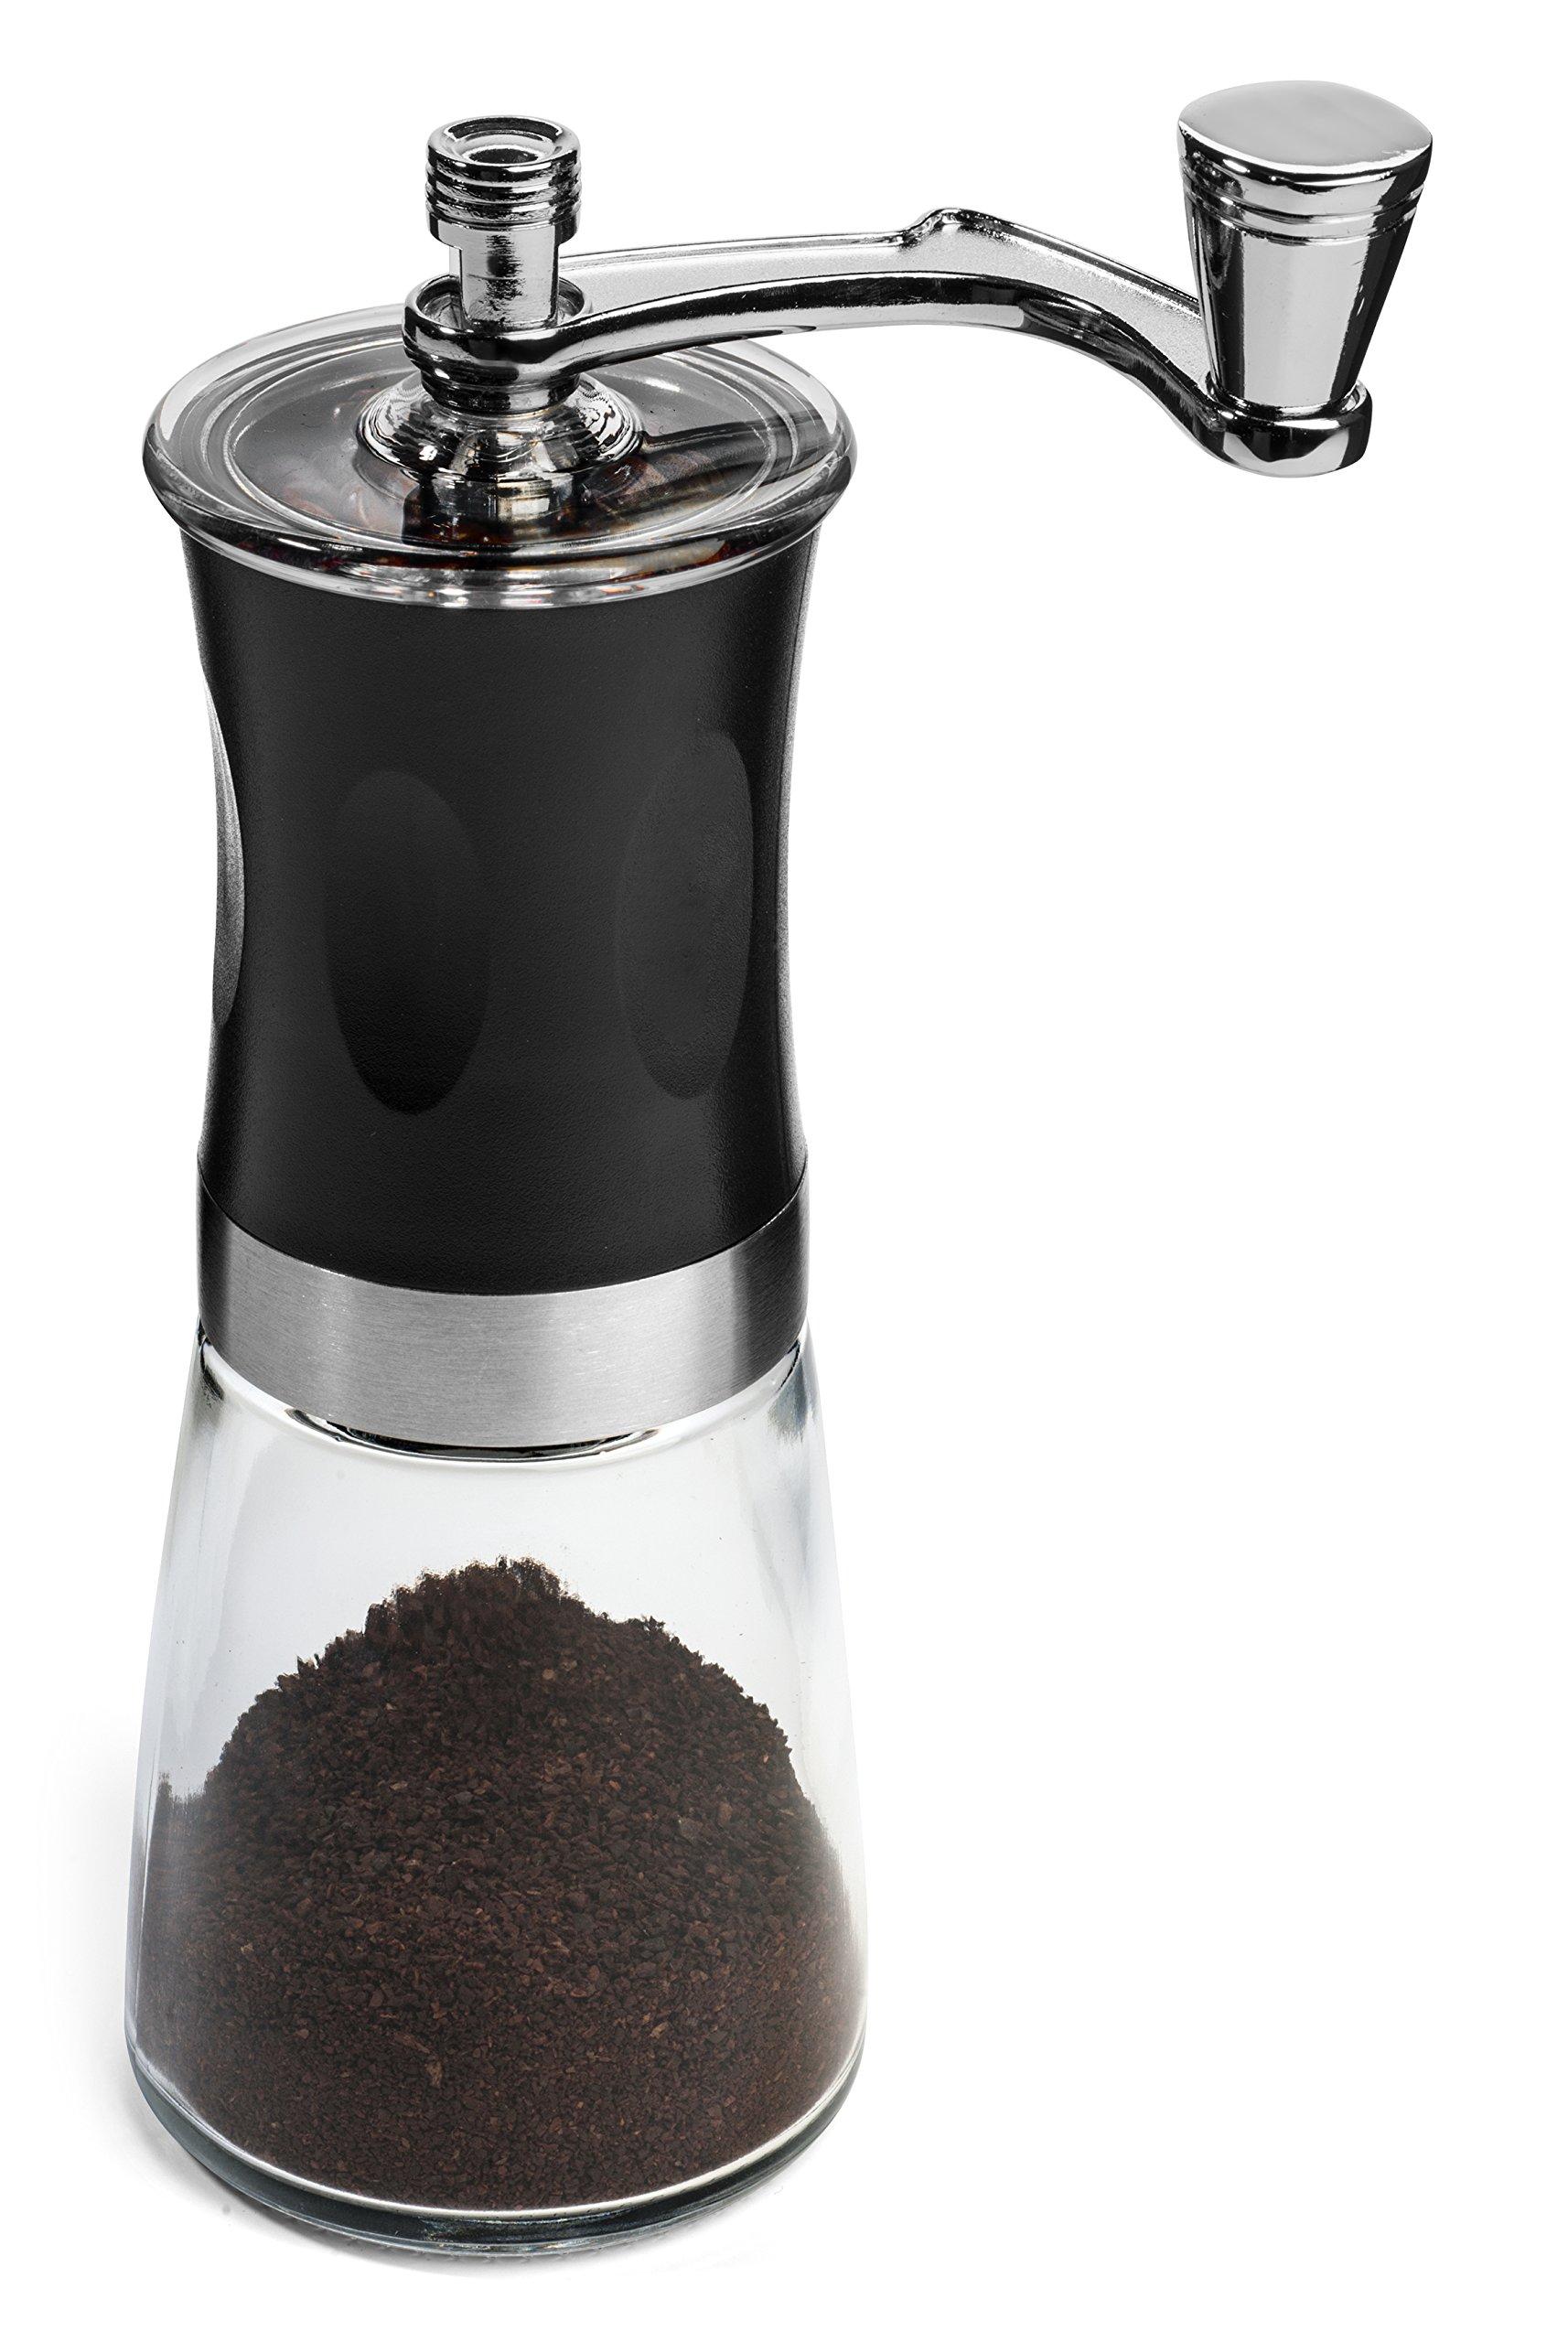 Best Burr Coffee Grinder ~ Idylchomes kona coffee grinder best manual conical burr